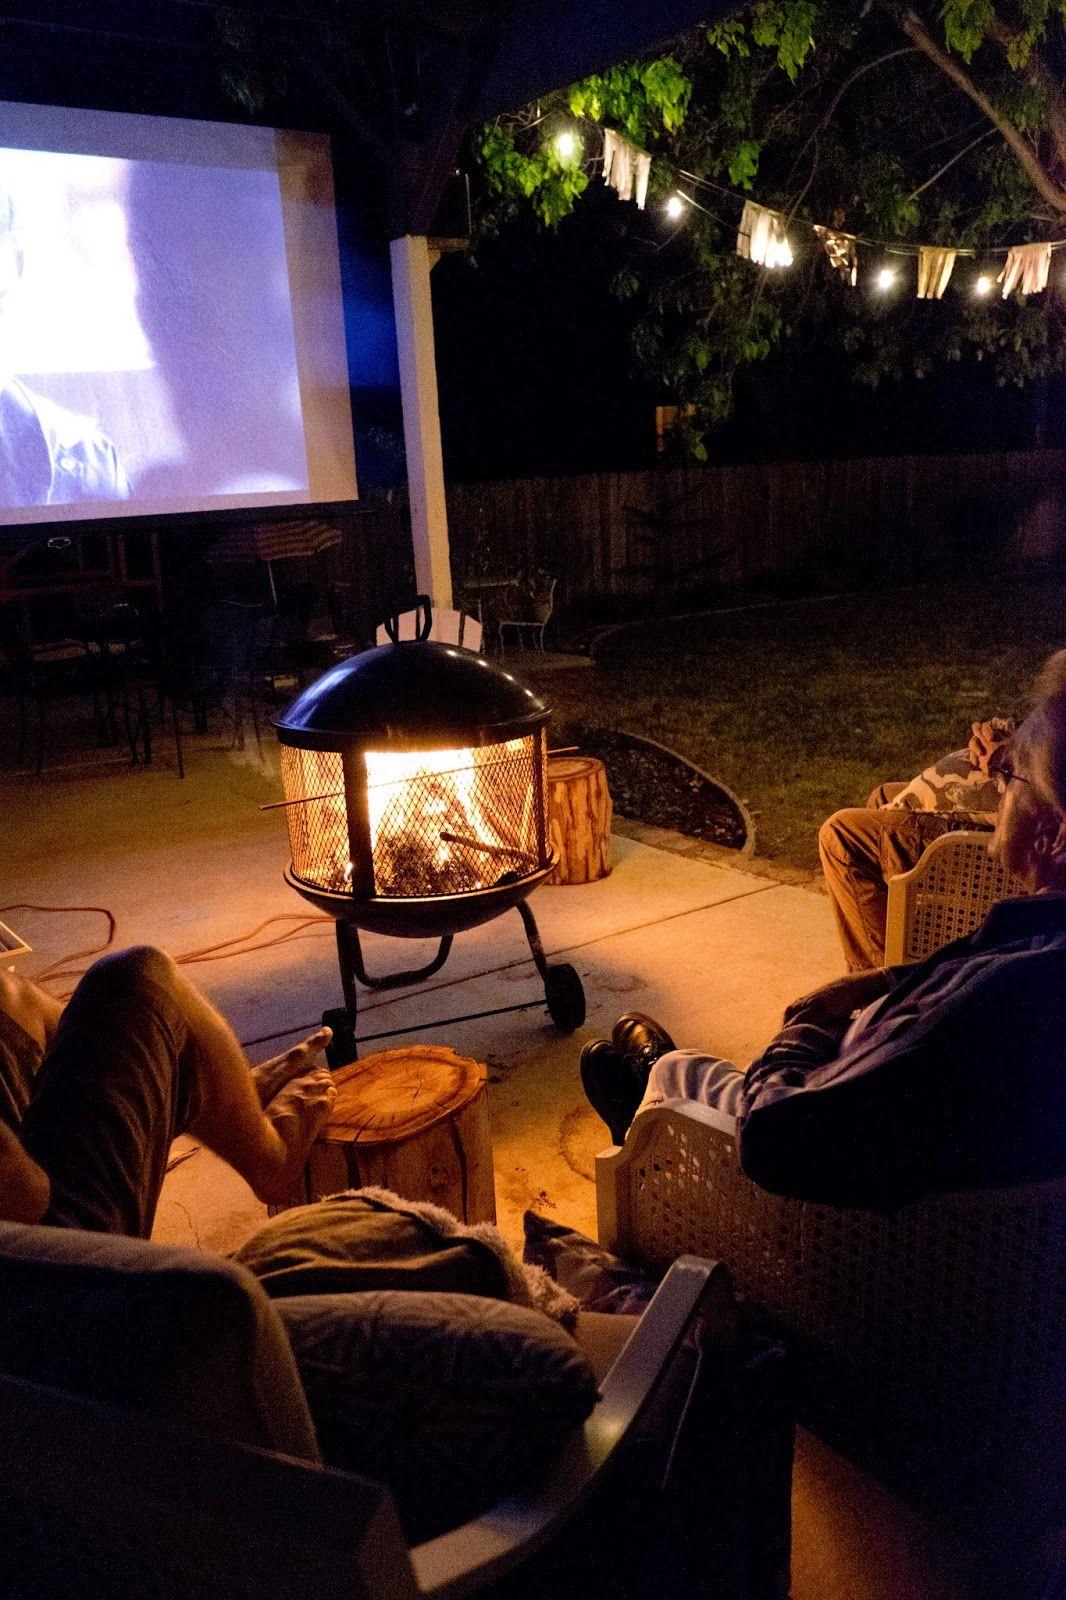 fall backyard birthday party and movie night diy ideas